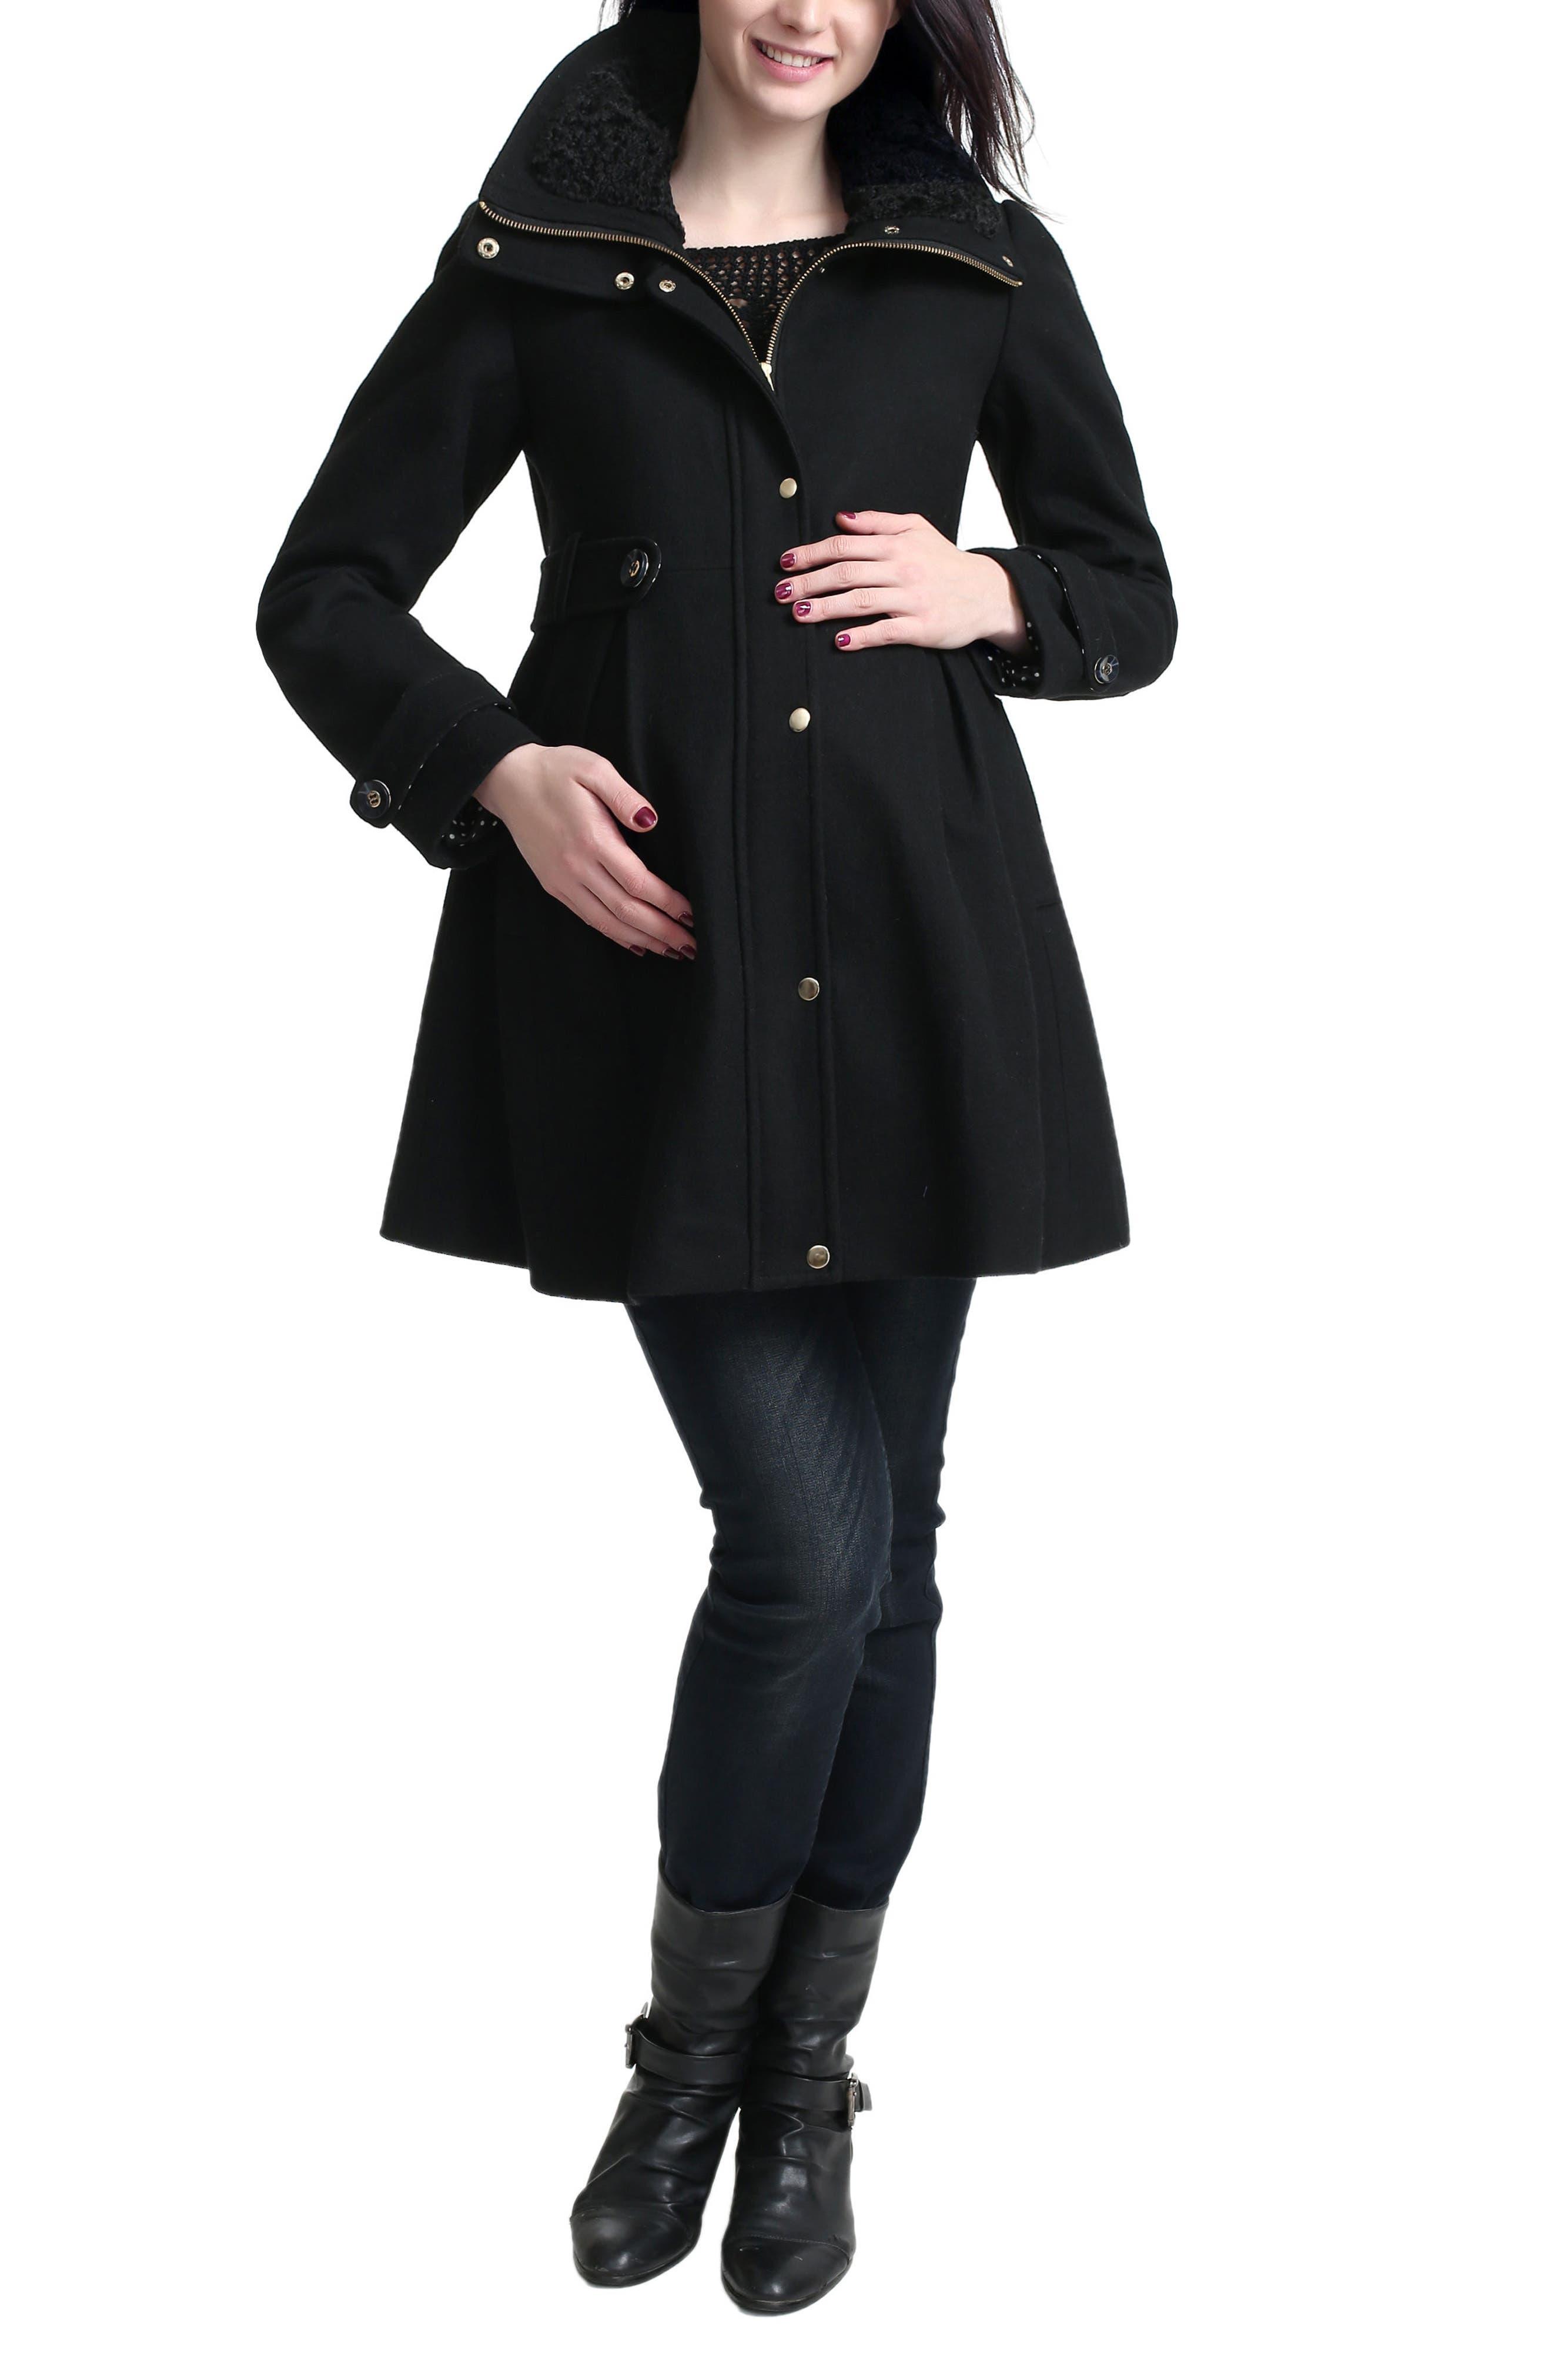 Main Image - Kimi and Kai Olivia Wool Blend Maternity Coat